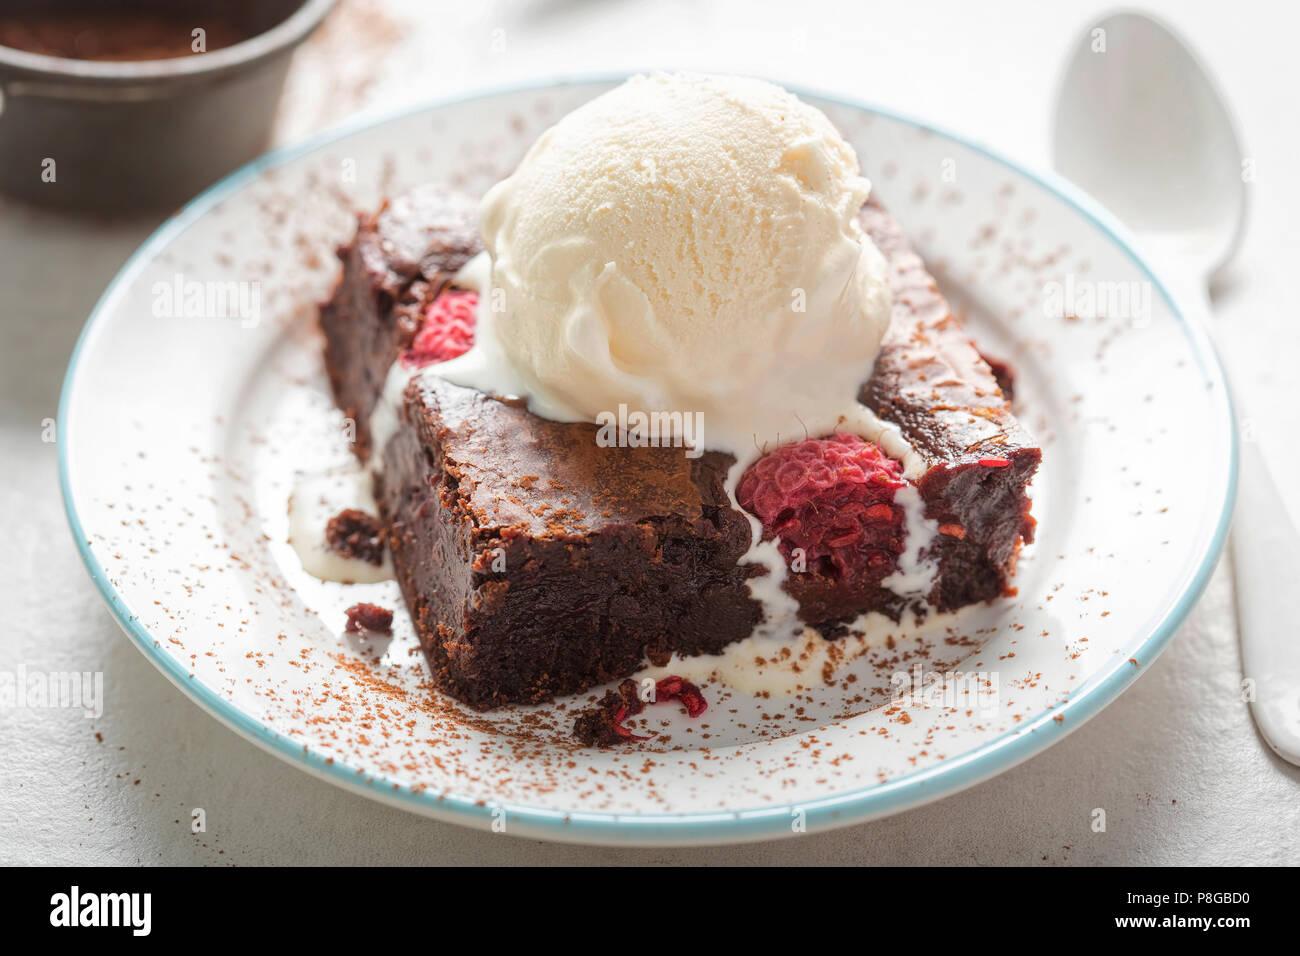 Raspberry chocolate brownies with vanilla ice creams - Stock Image